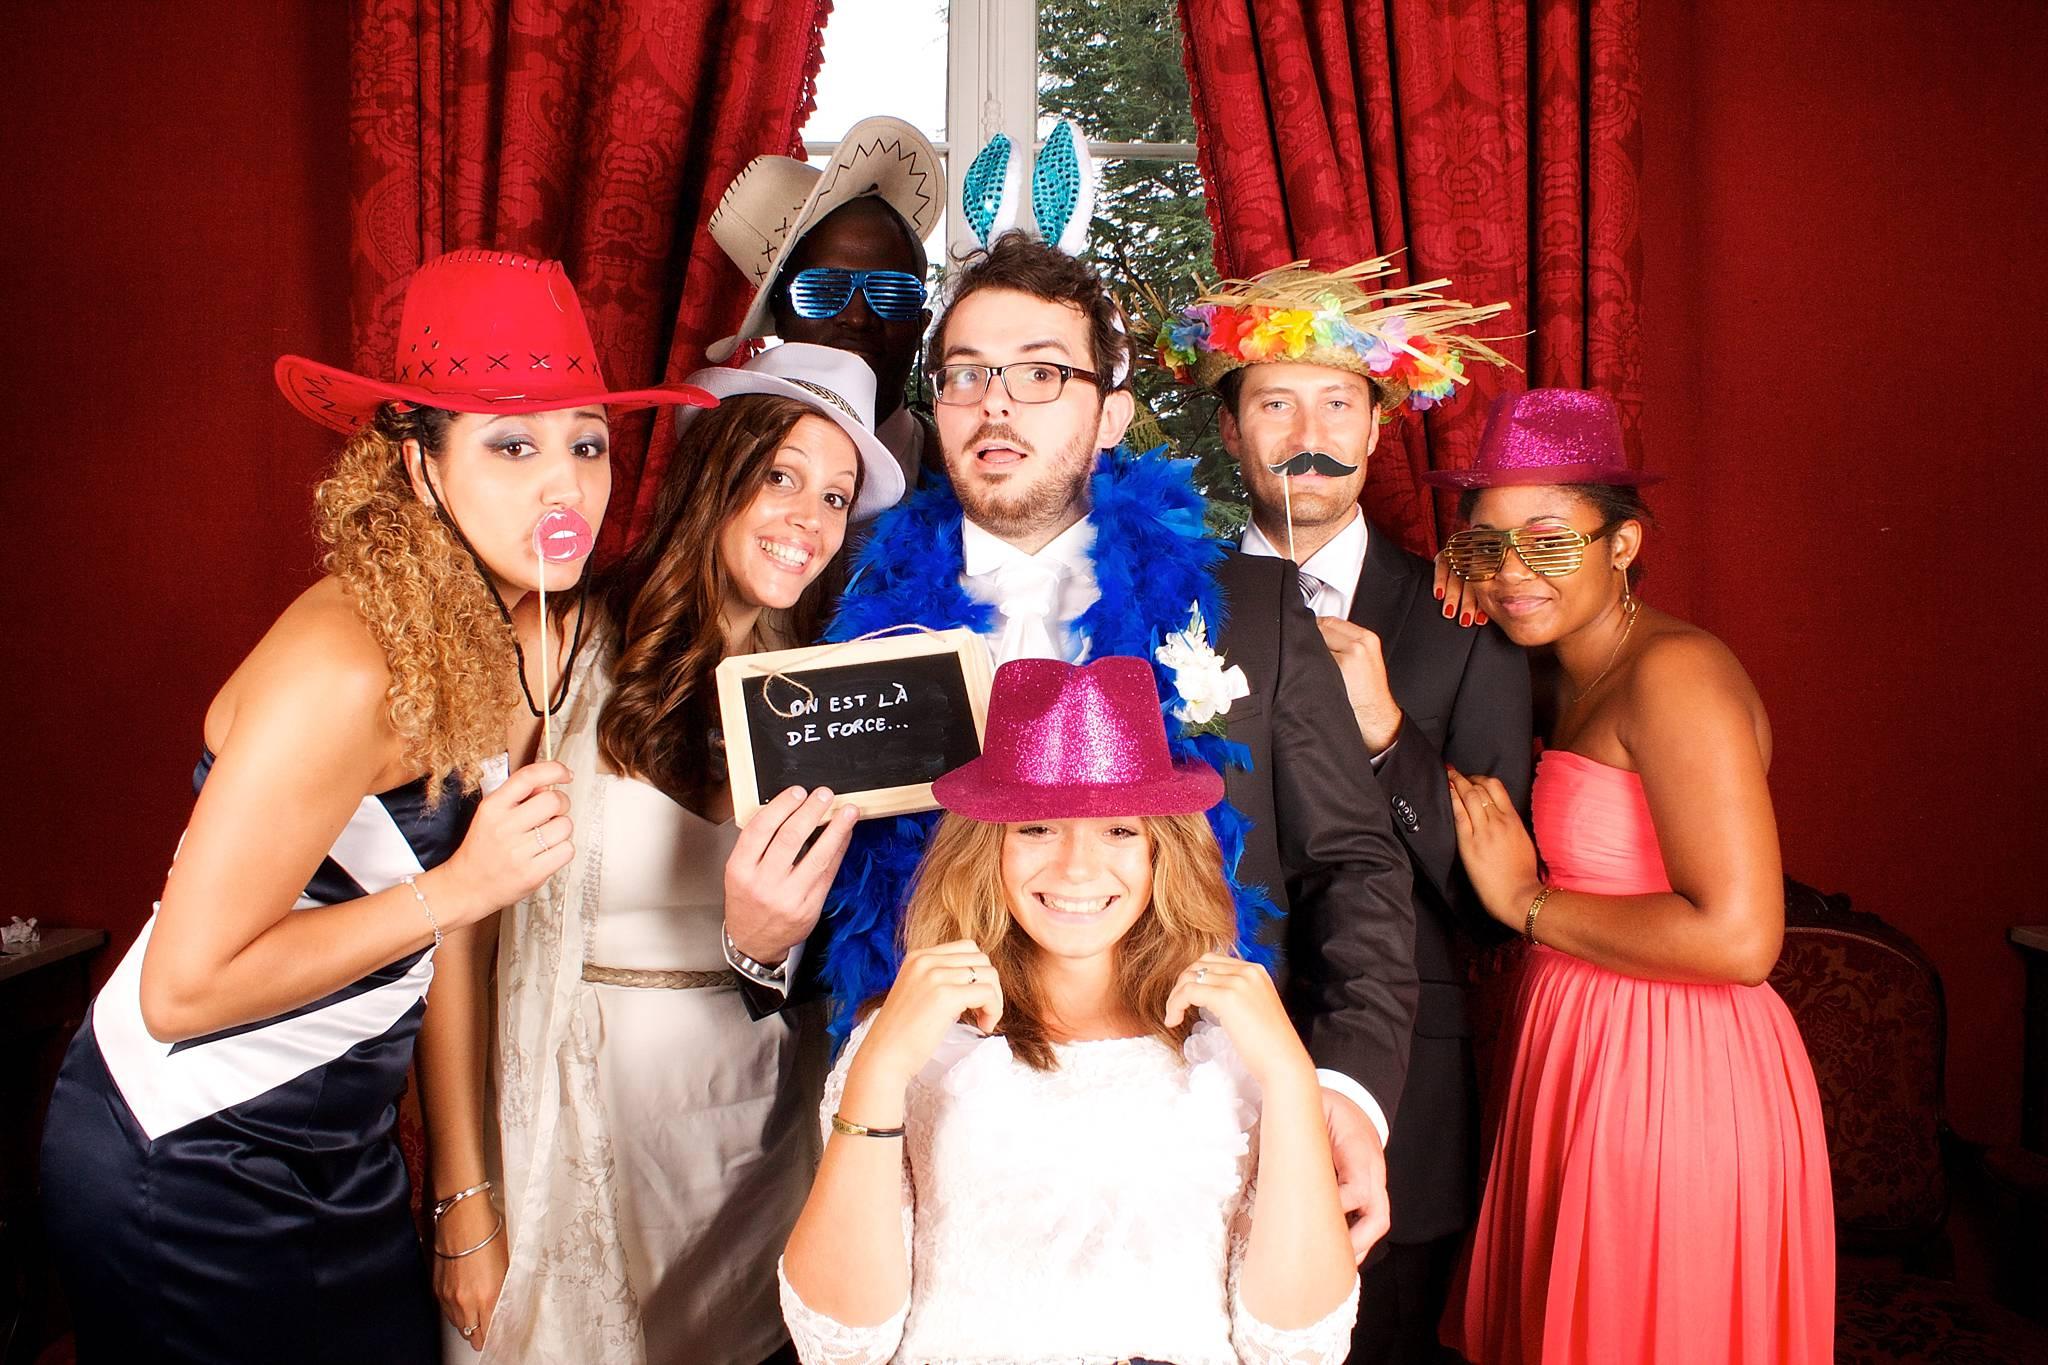 03_photobooth-mariage-bordeaux-gironde-dordogne-charentes-alexandre-roschewitz-photographies_2048px